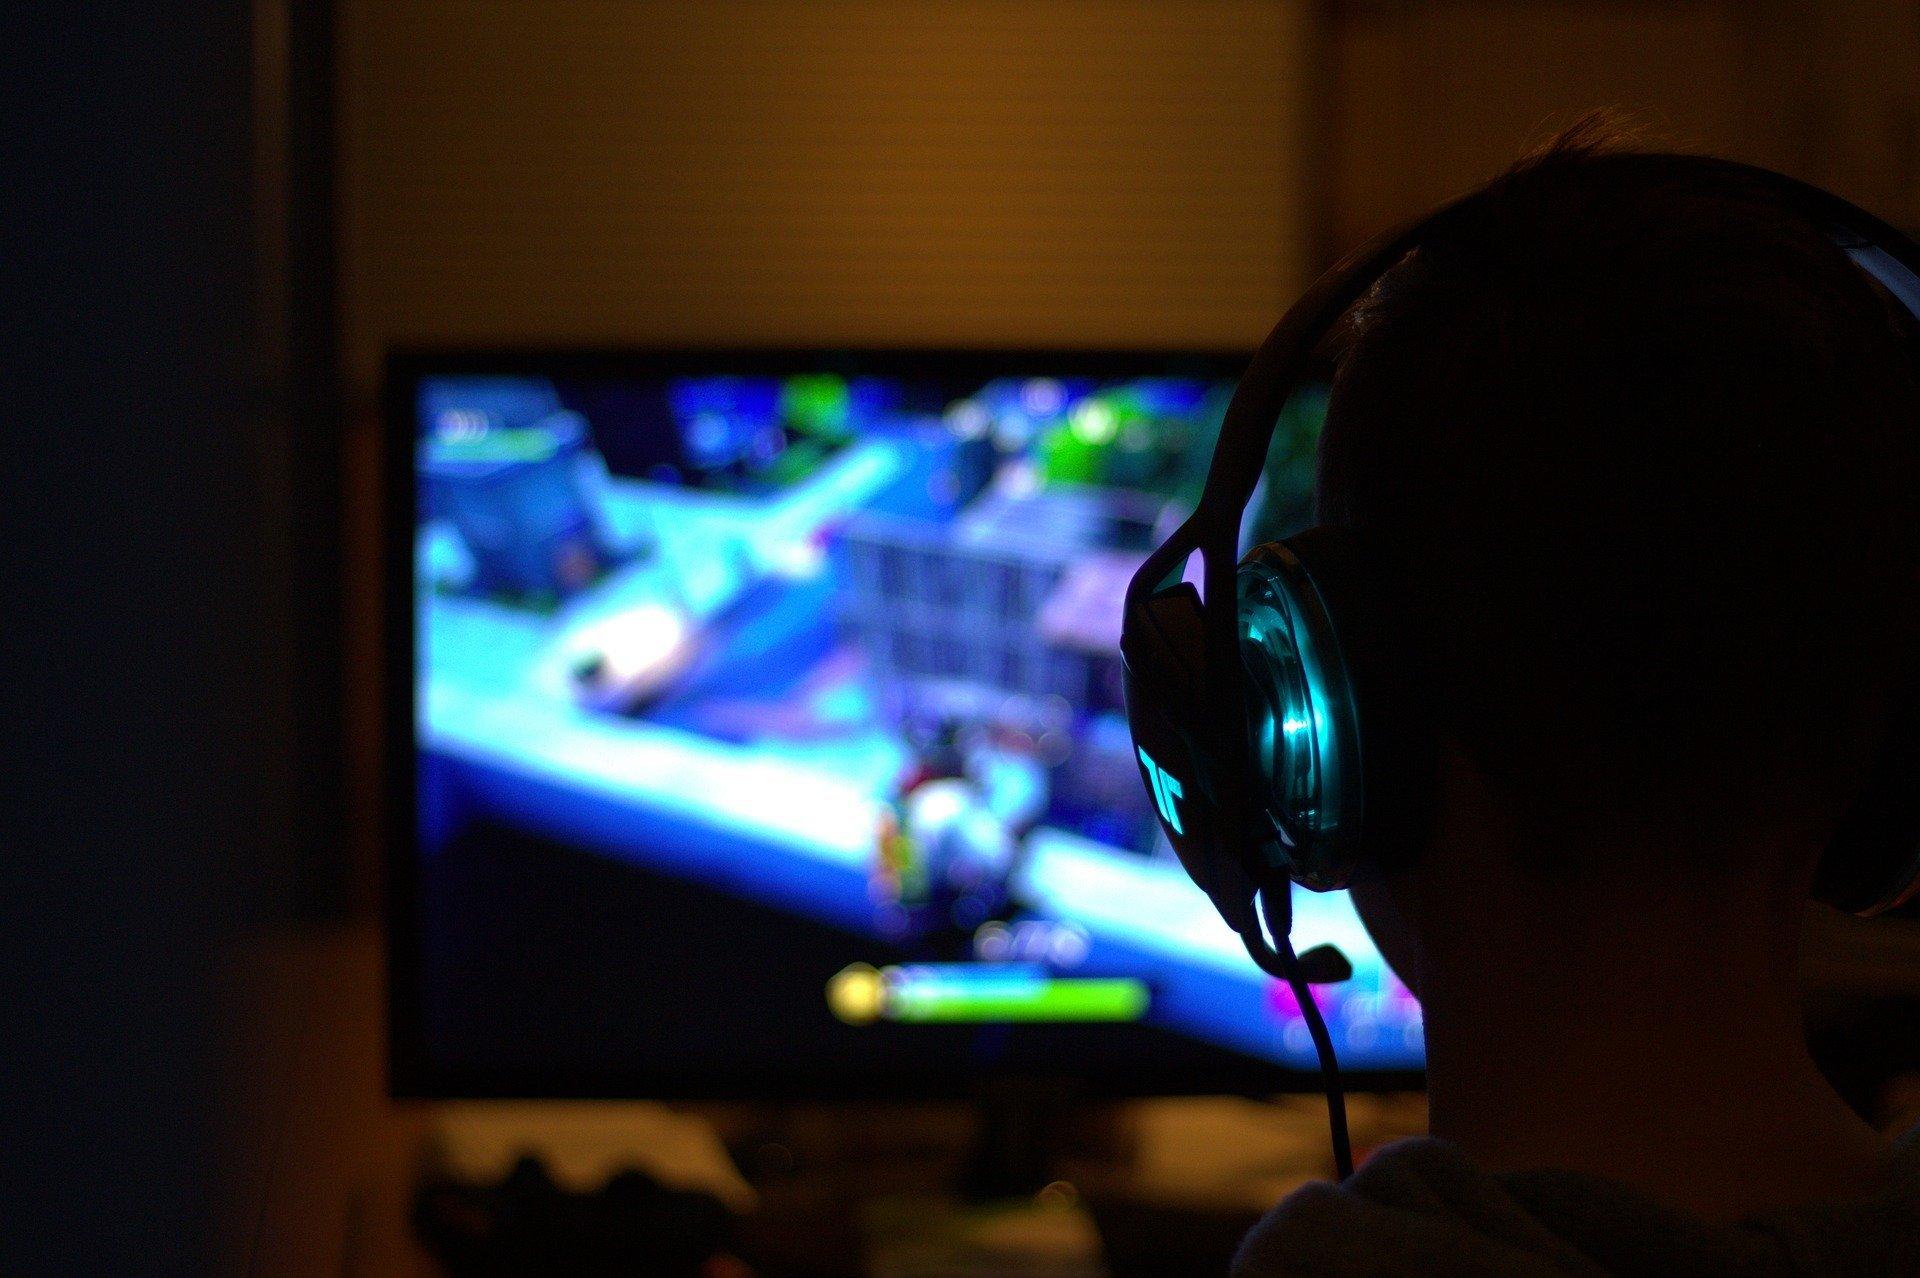 Best Gaming PC build under 50000 in India